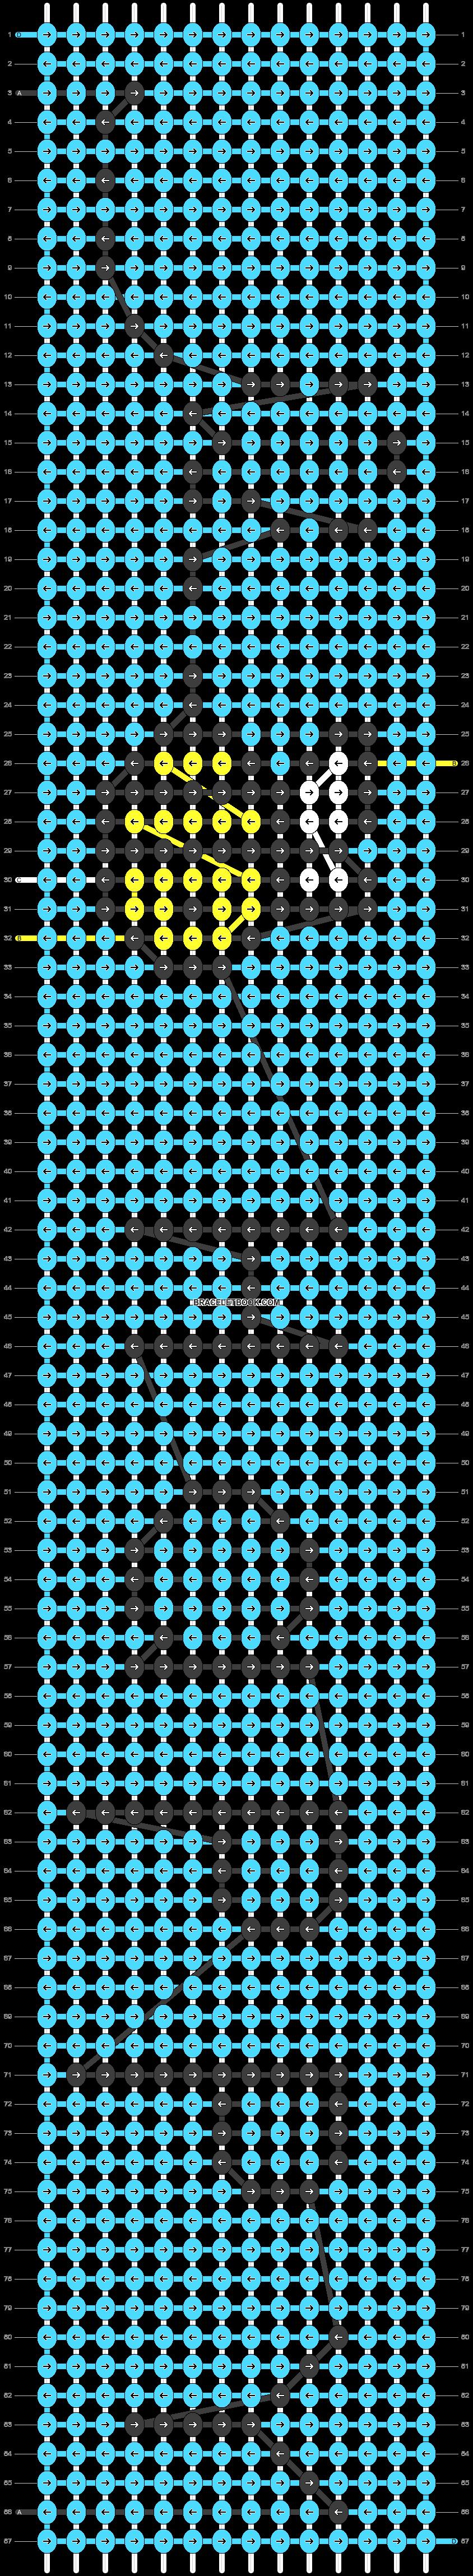 Alpha pattern #41193 pattern